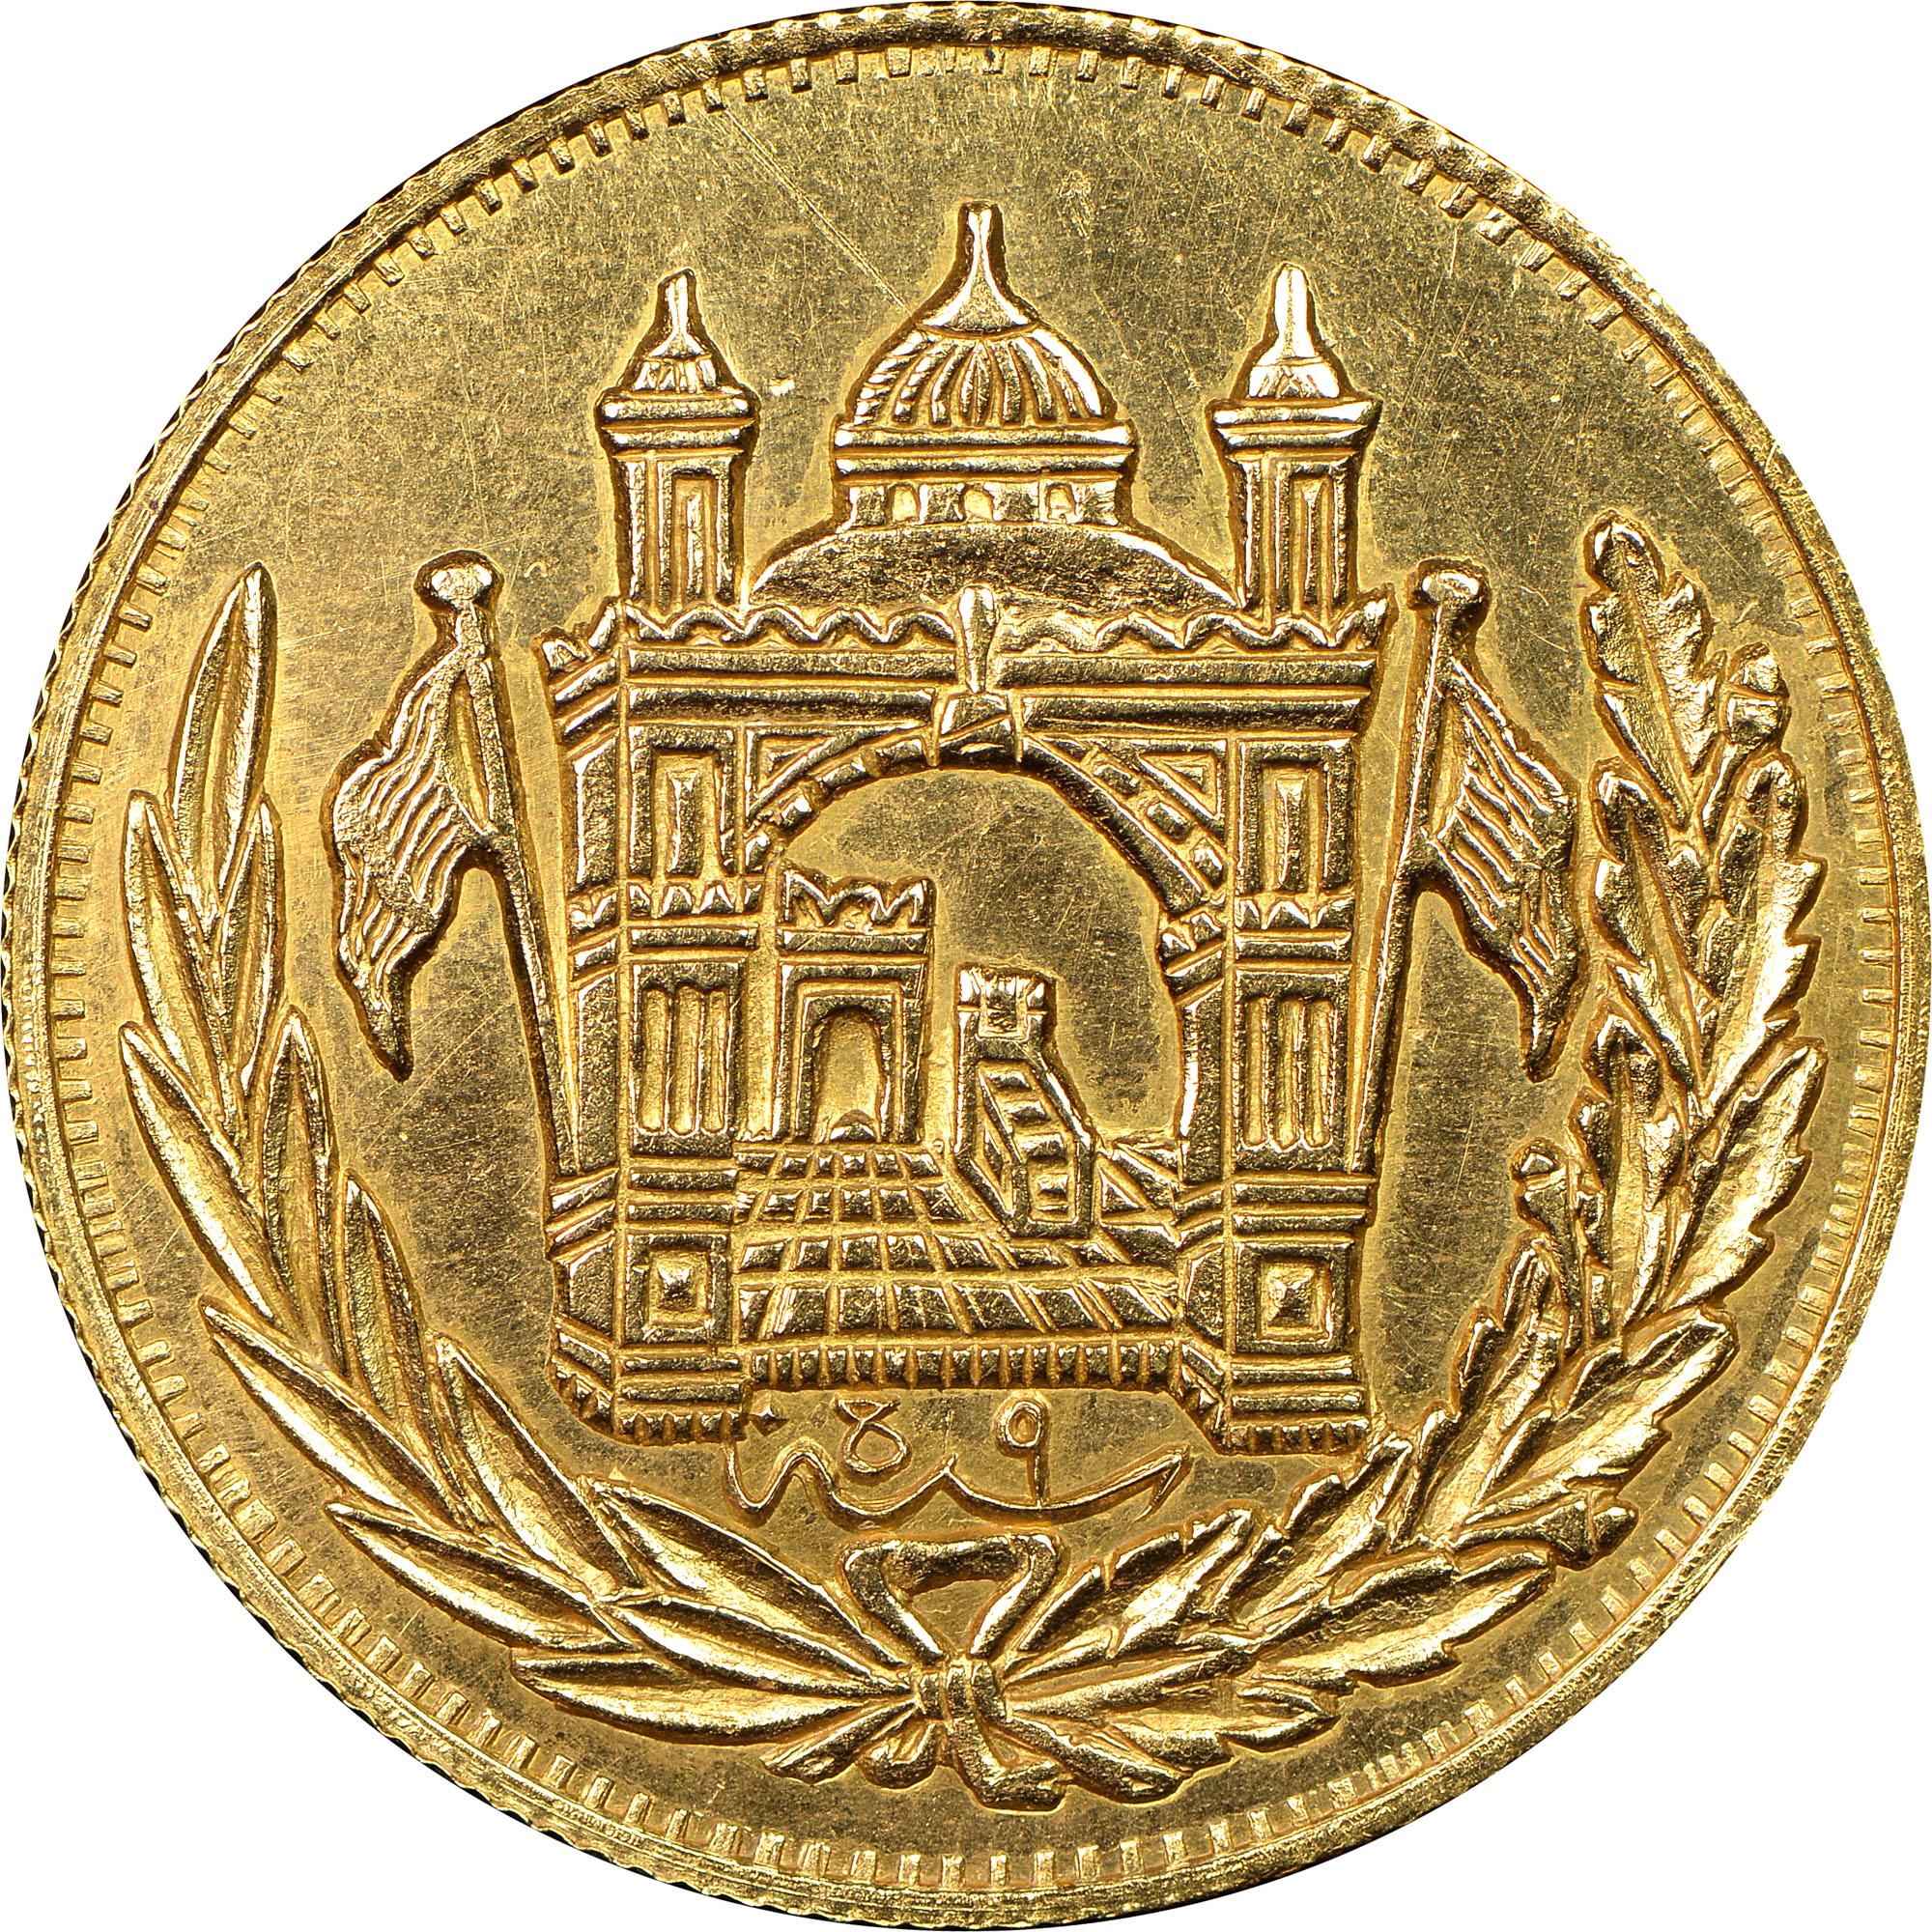 1306/9 (1927) Afghanistan 2-1/2 Amani reverse